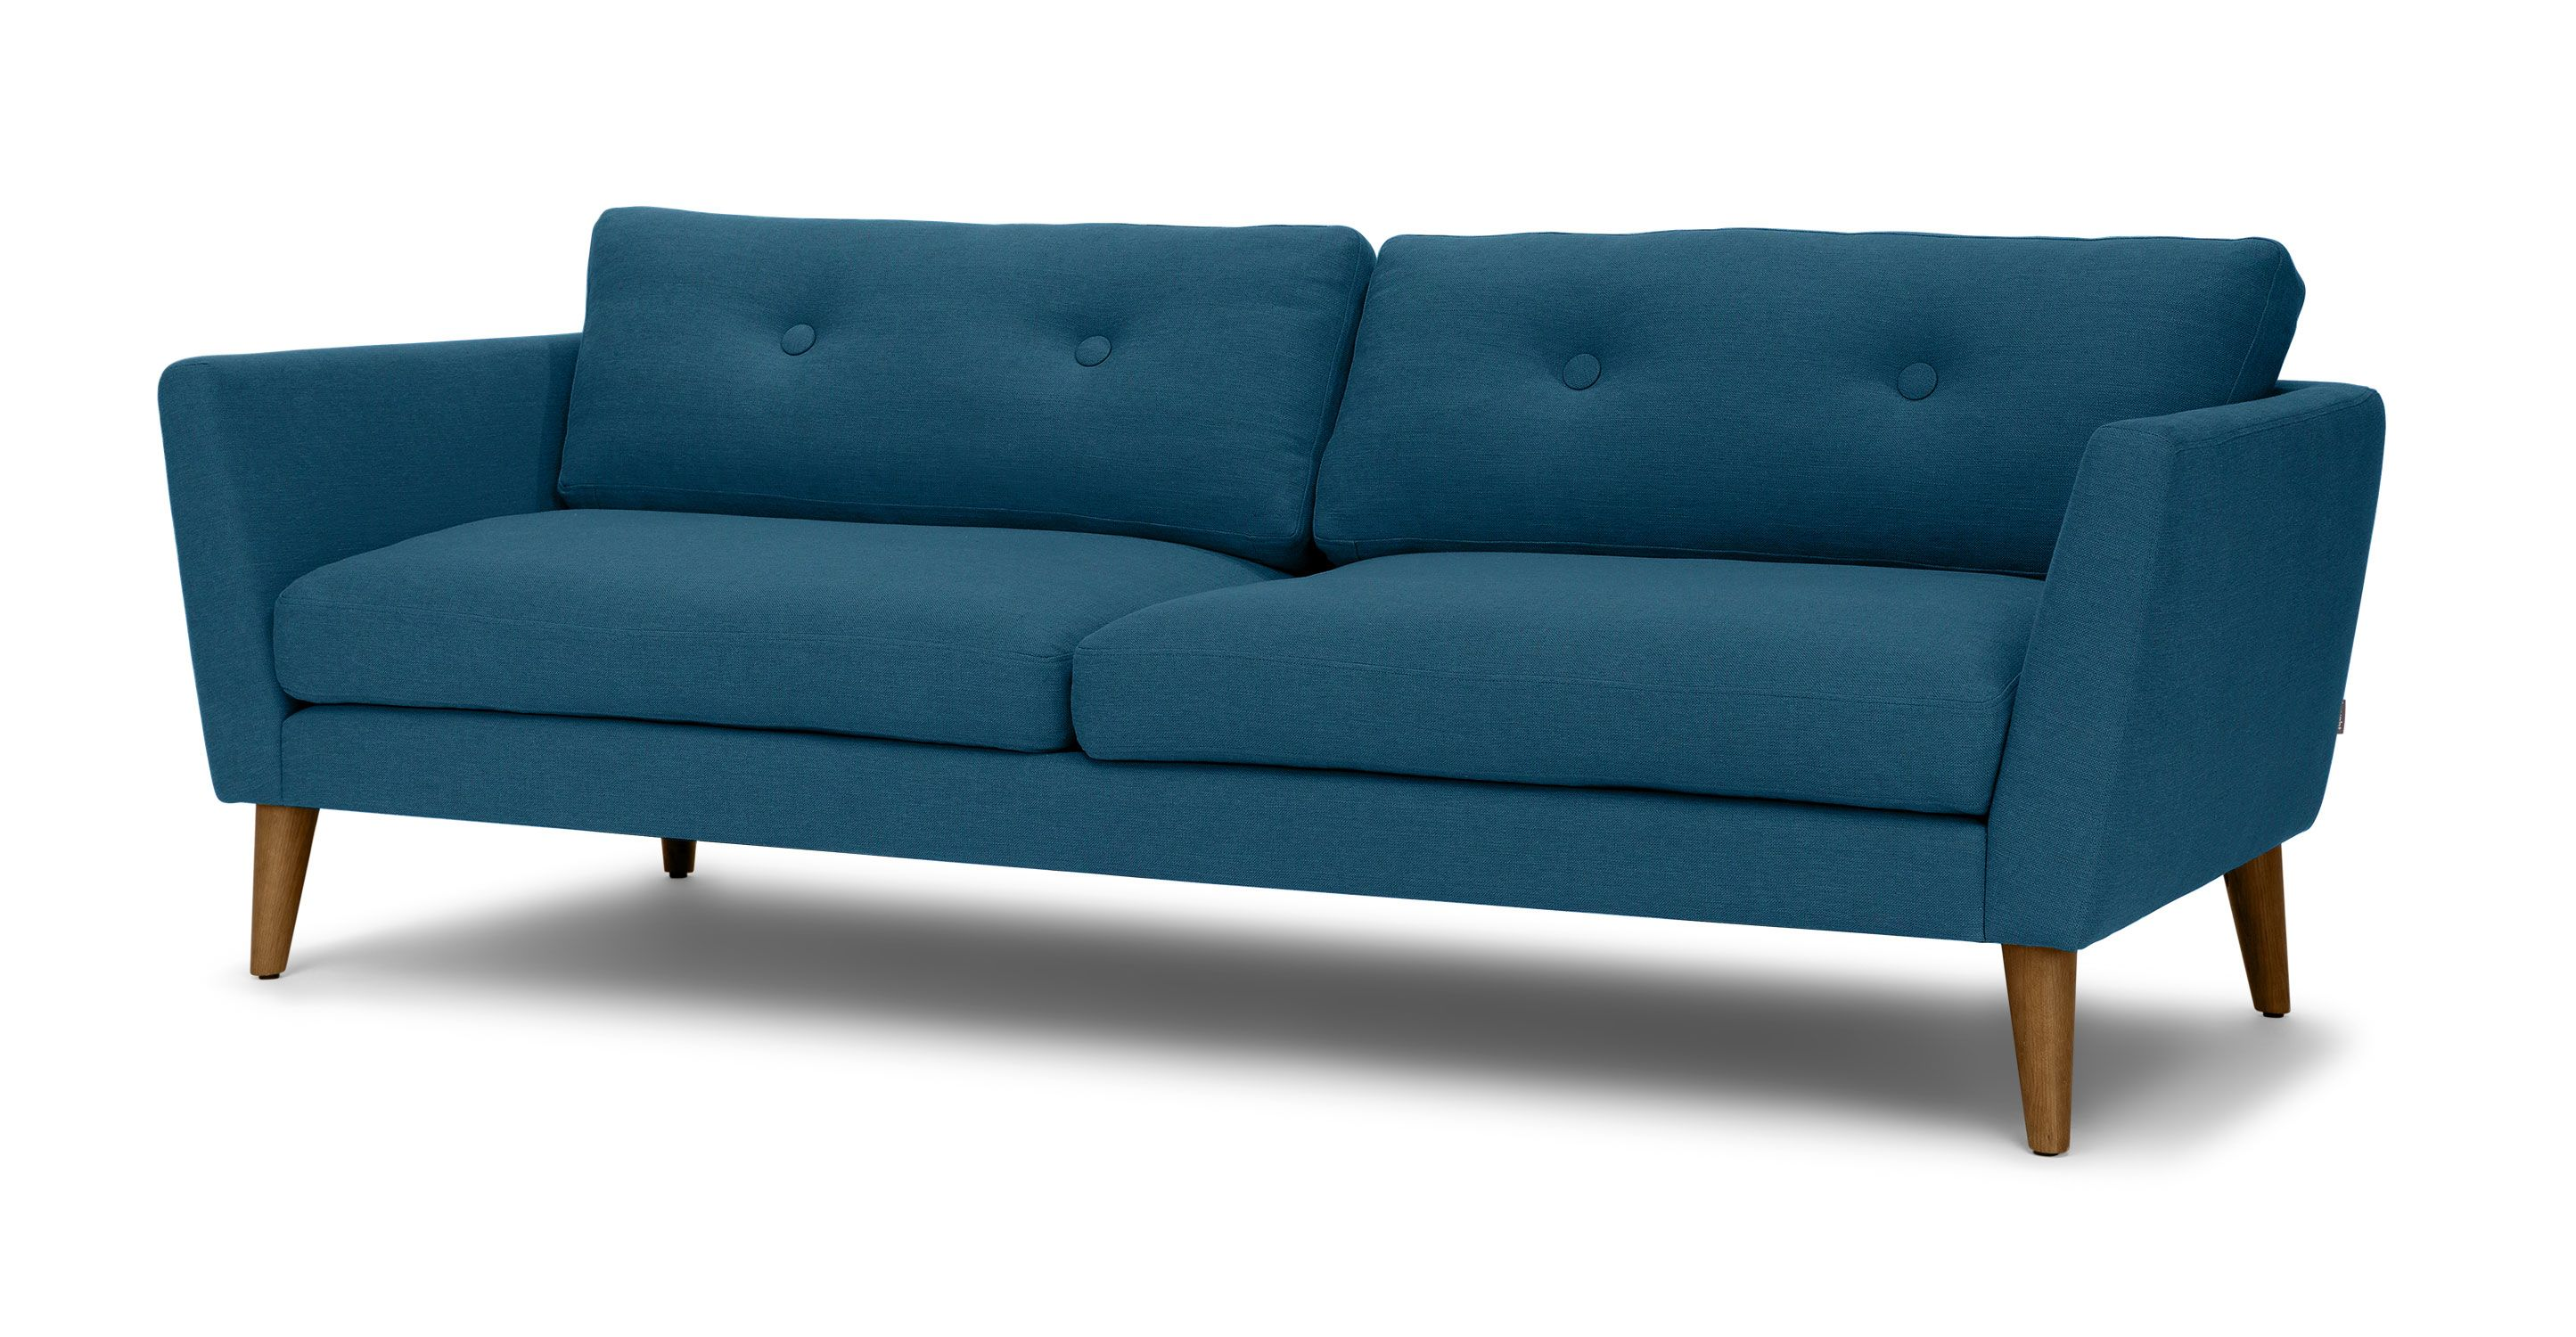 Emil Marine Blue Sofa Sofas Article Modern, Mid